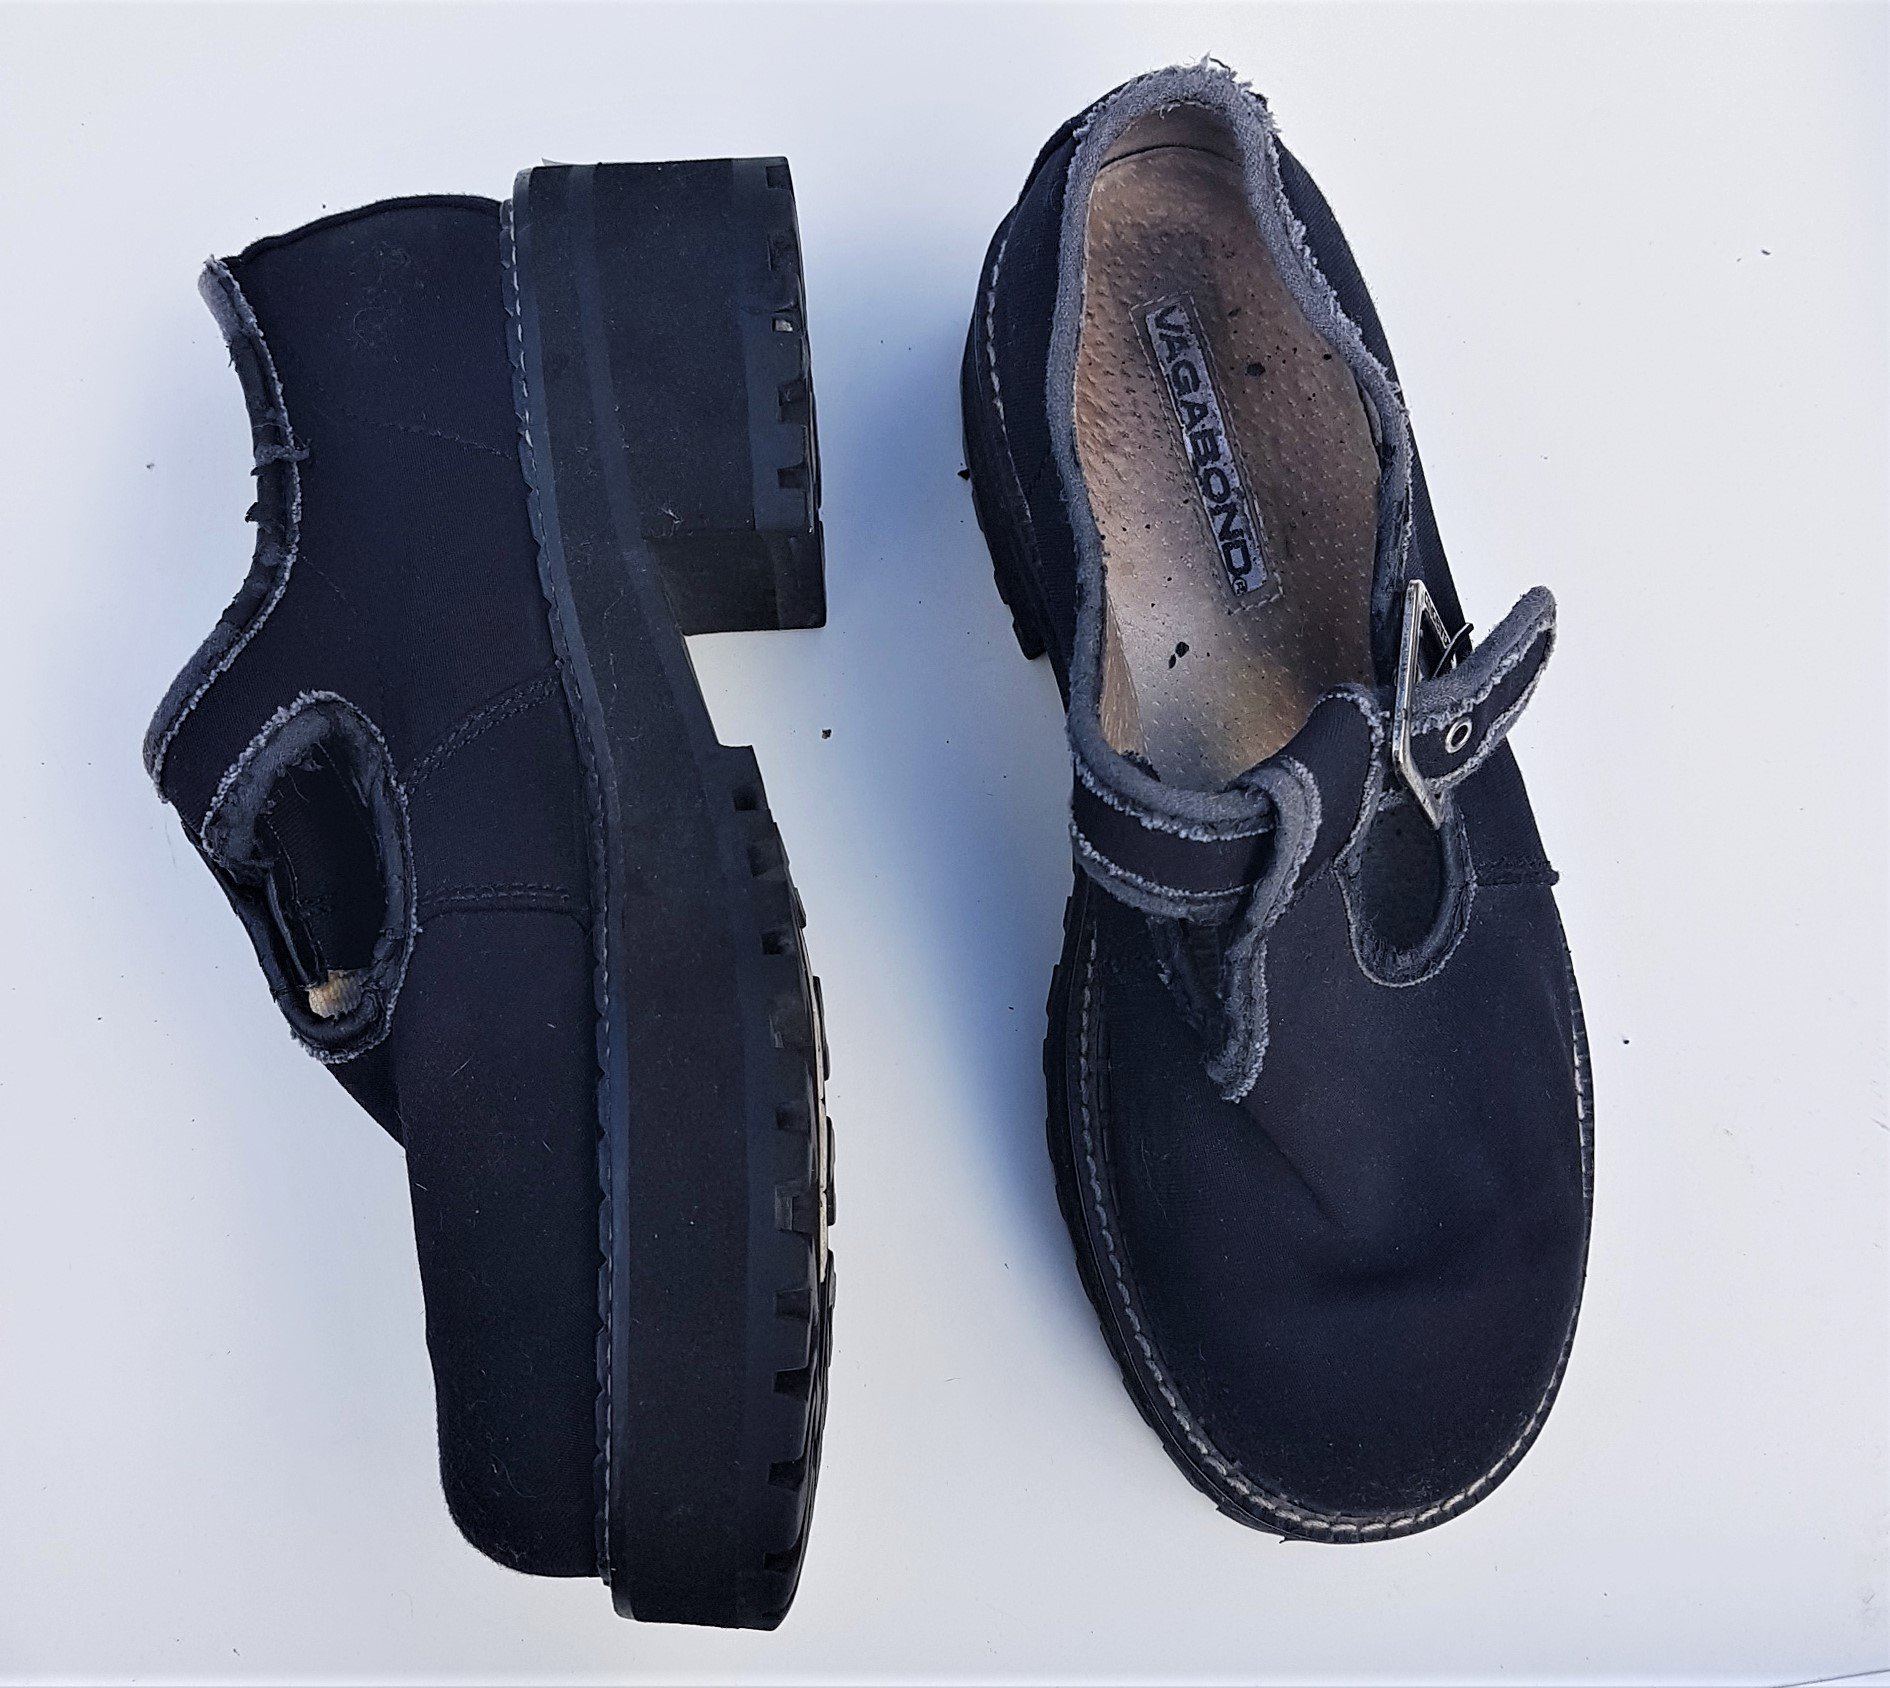 Retro vagabond skor, storlek 38